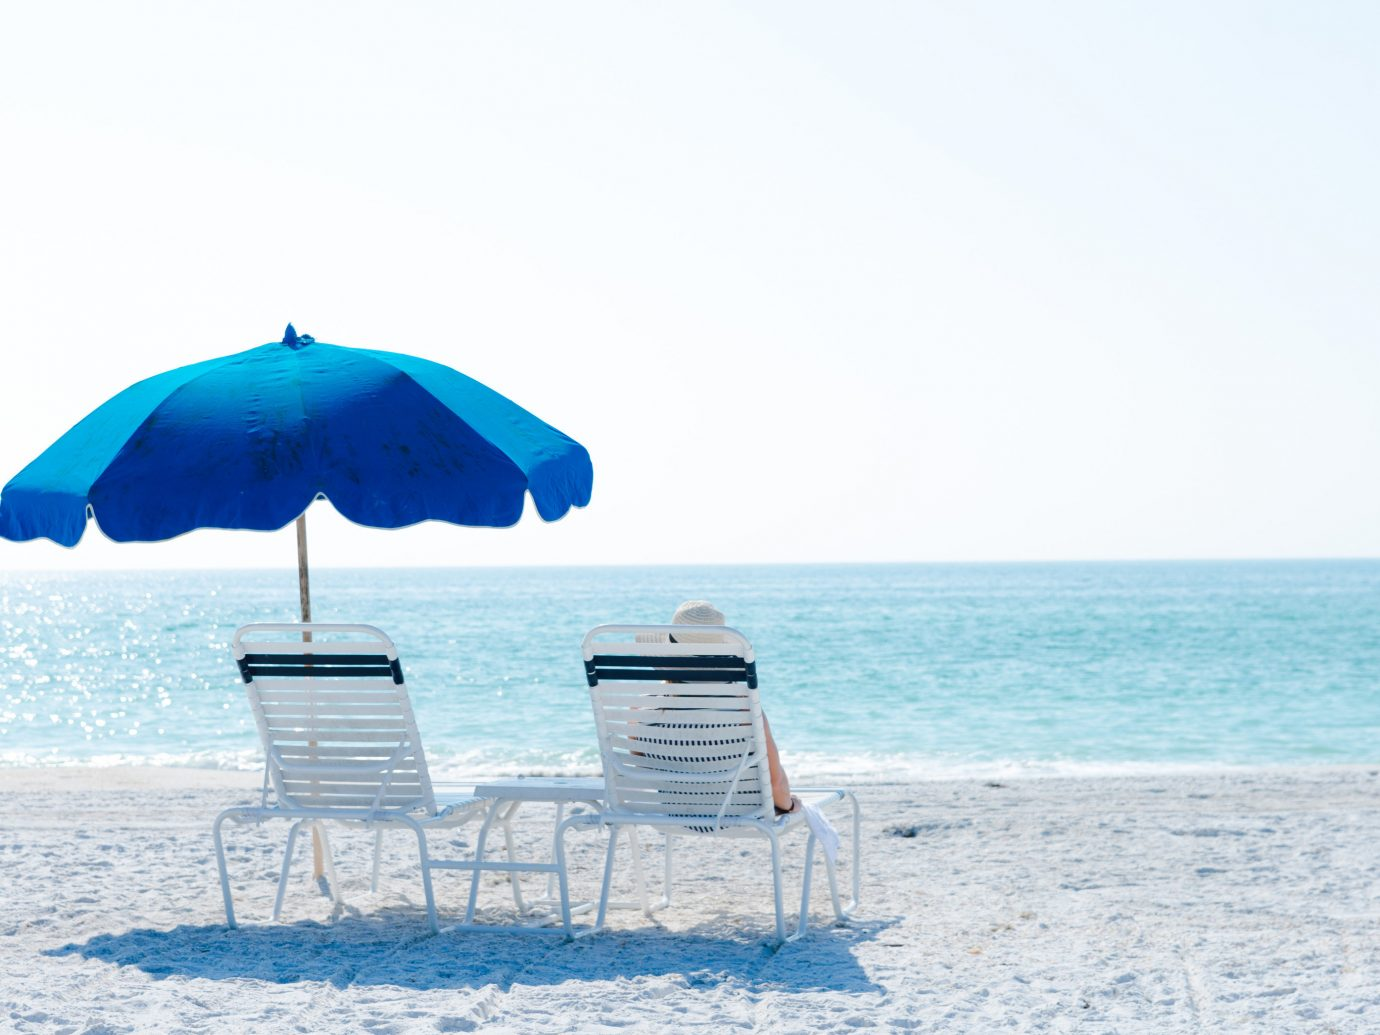 Trip Ideas umbrella outdoor sky chair accessory Nature blue Sea Ocean fashion accessory Beach shore lawn